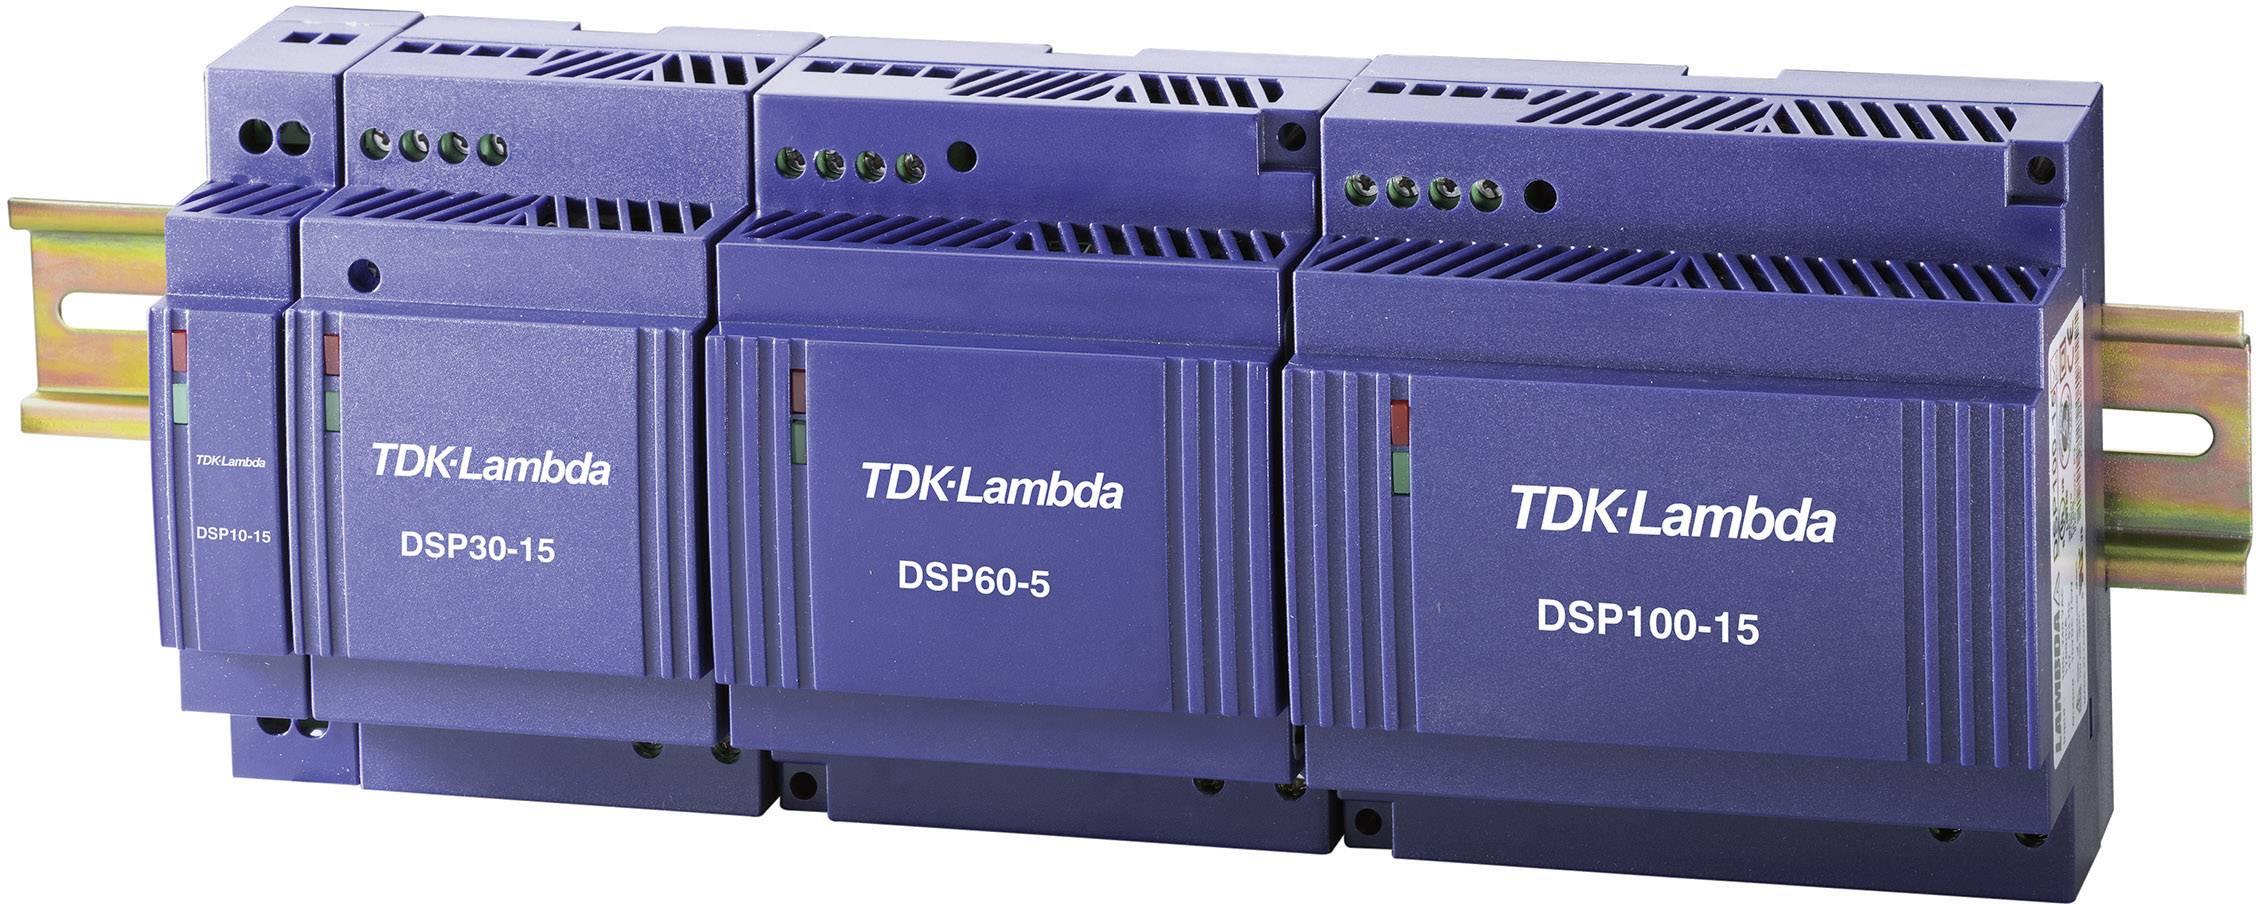 Sieťový zdroj na montážnu lištu (DIN lištu) TDK-Lambda DSP-30-24, 1 x, 24 V/DC, 1.3 A, 31.2 W